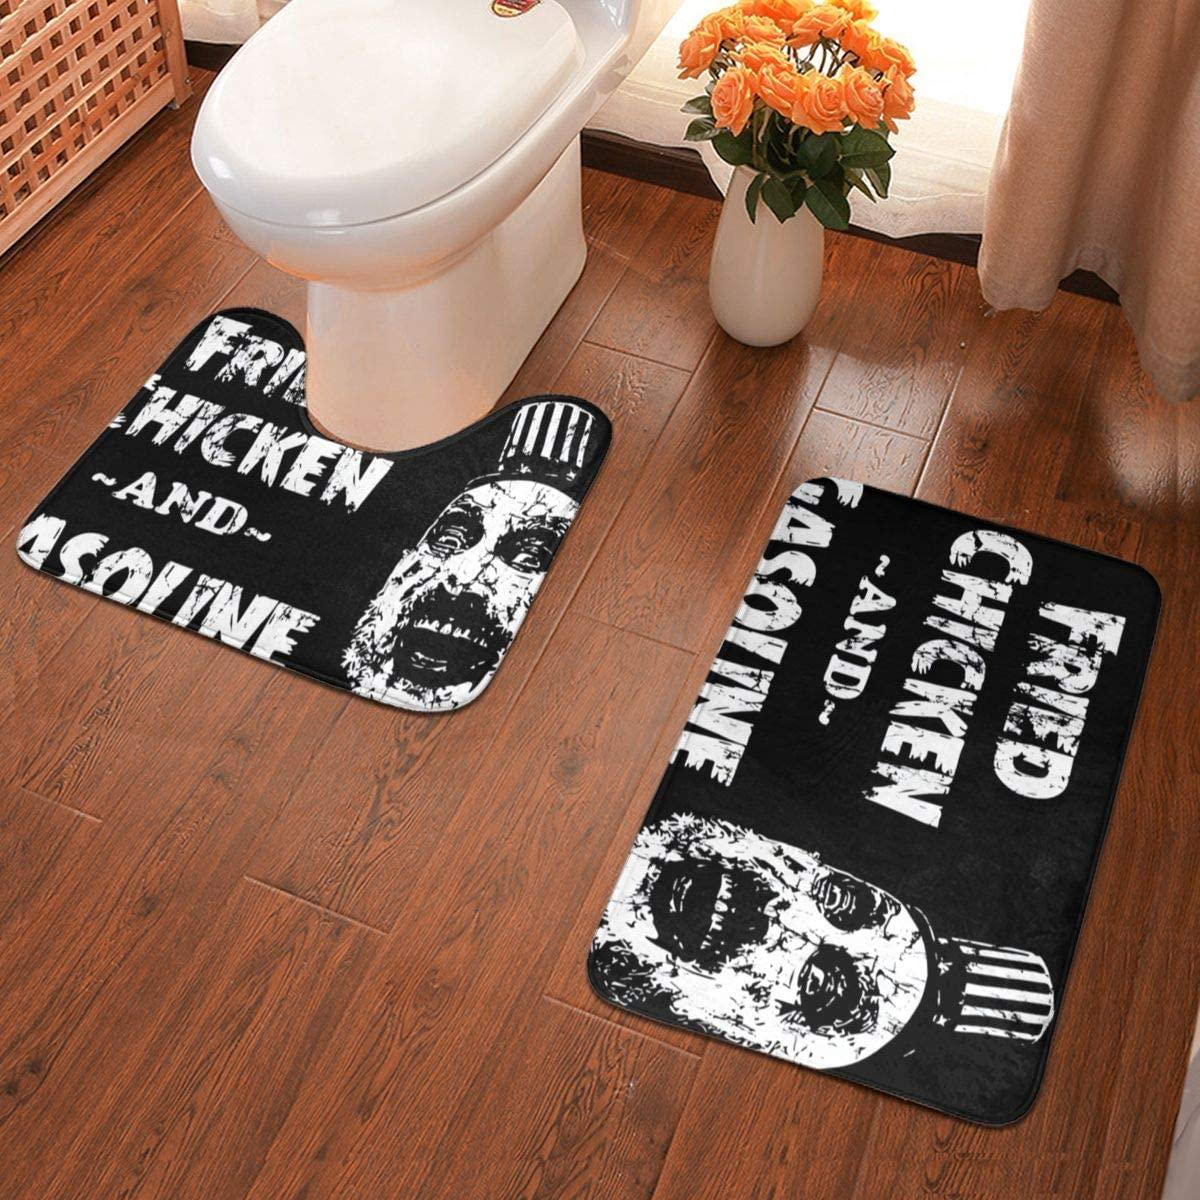 Qwertyi Captain Spaulding Bathroom Rug Bathroom Antiskid Pad Mats Set 2 Piece Pads Bath Mat